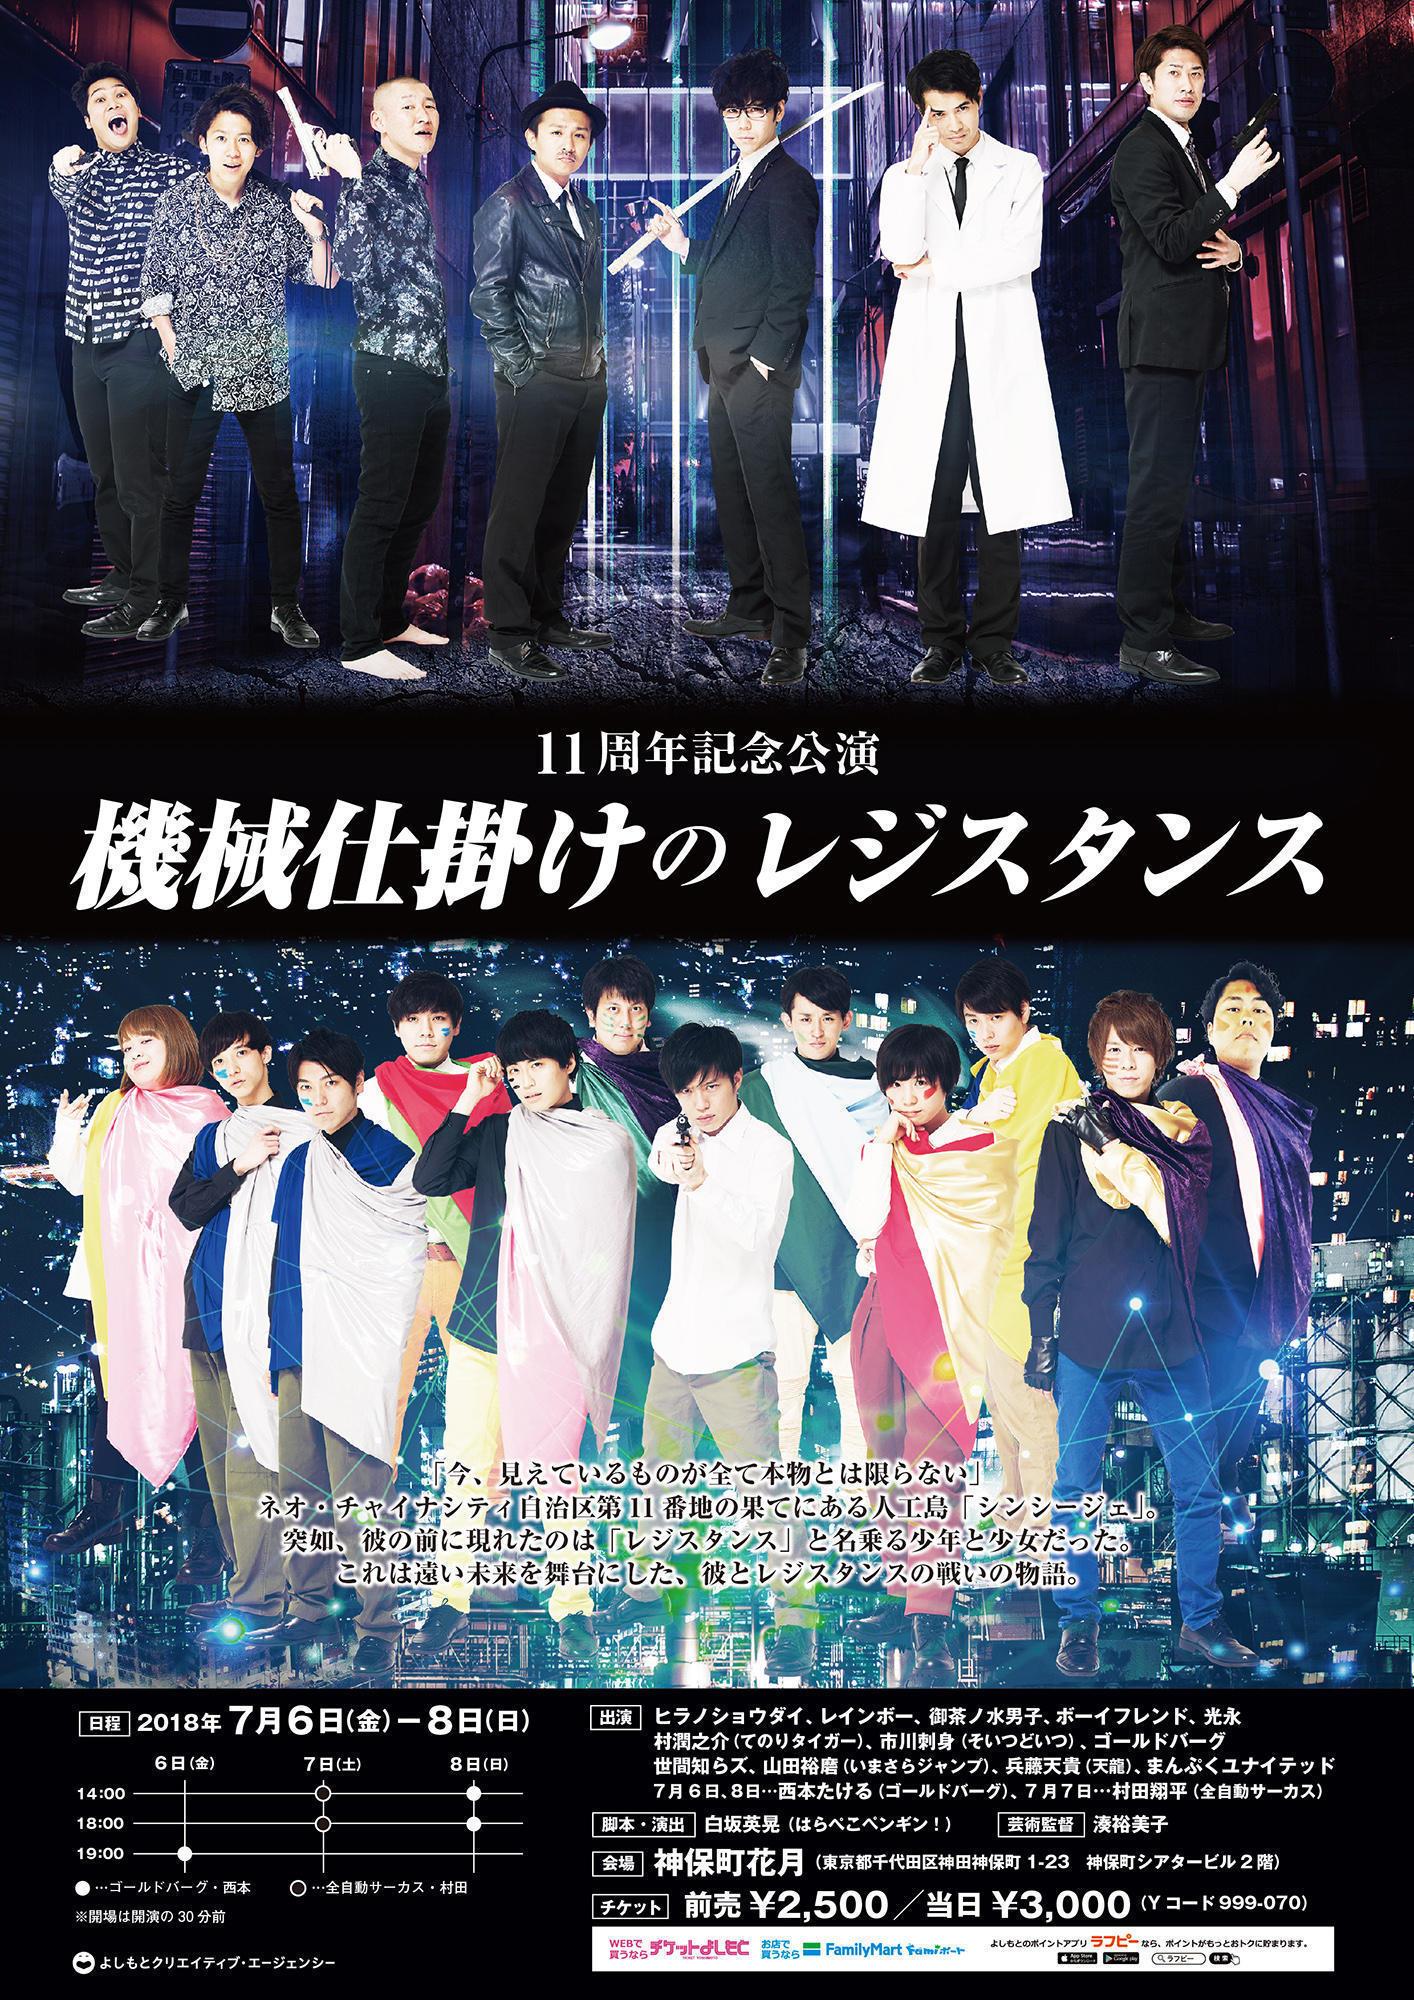 http://news.yoshimoto.co.jp/20180703053507-539cca3ca9b3b550971a6a35abe7b1be082cfcf1.jpg